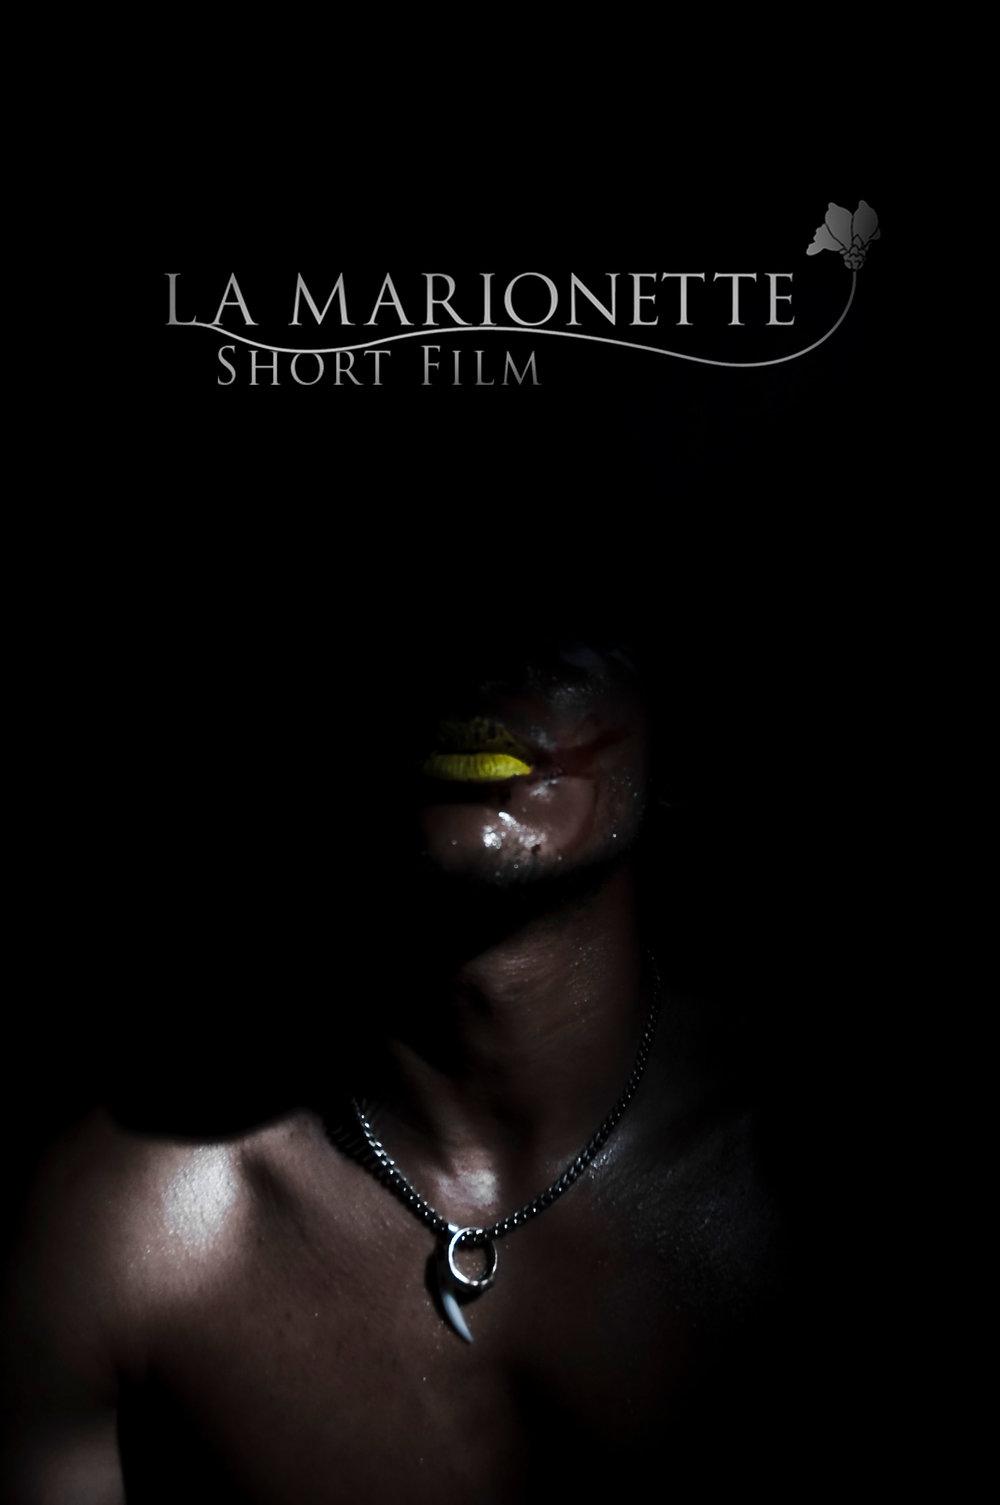 la-marionette-poster.png